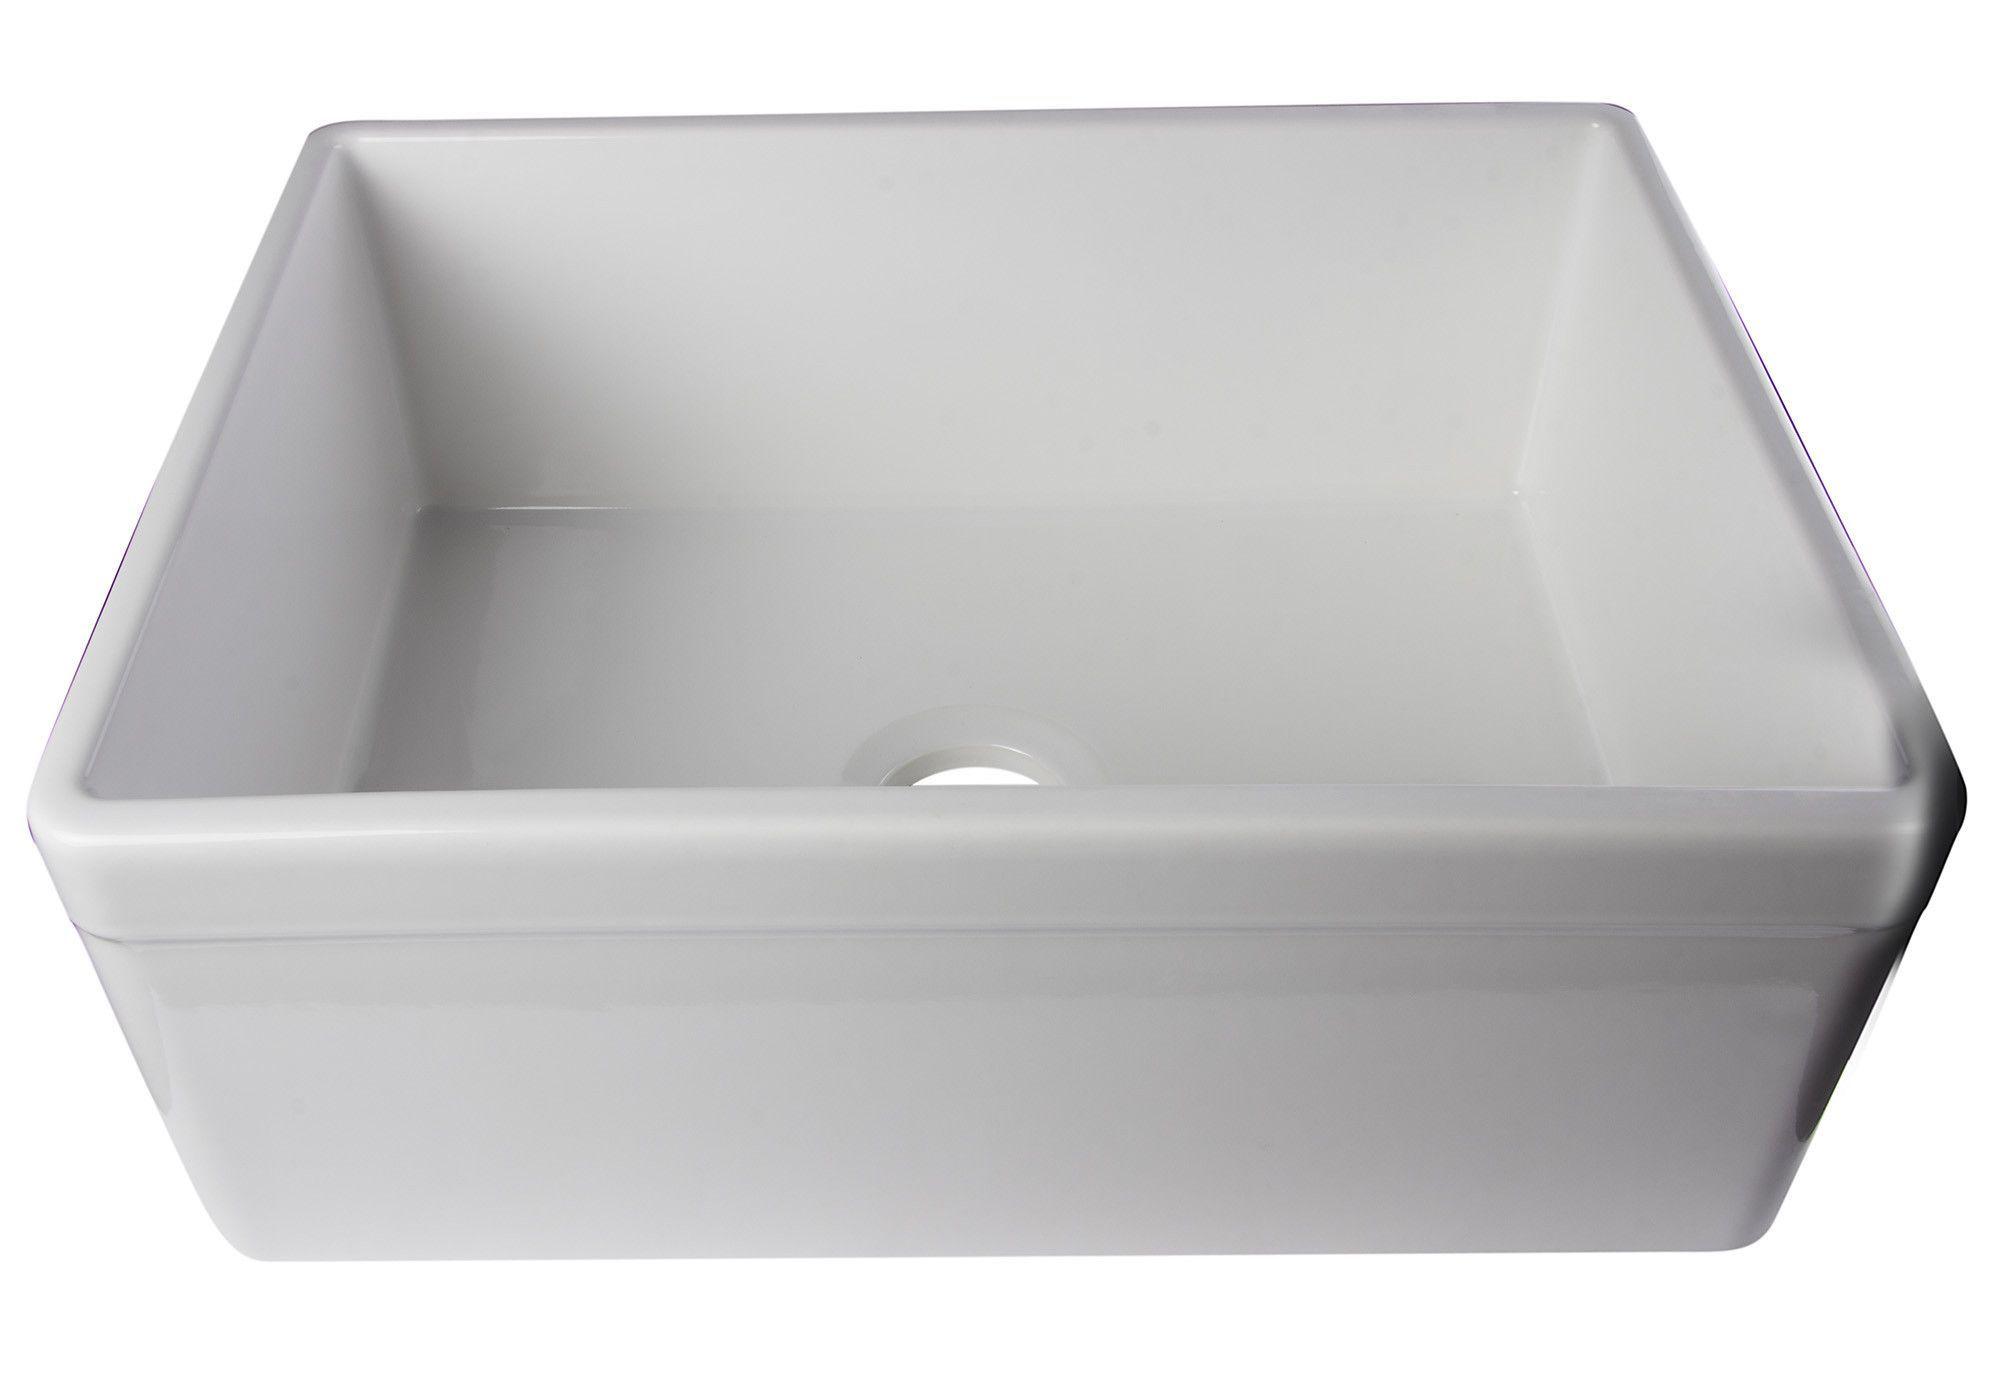 Alfi brand ab506w white 26 decorative lip single bowl